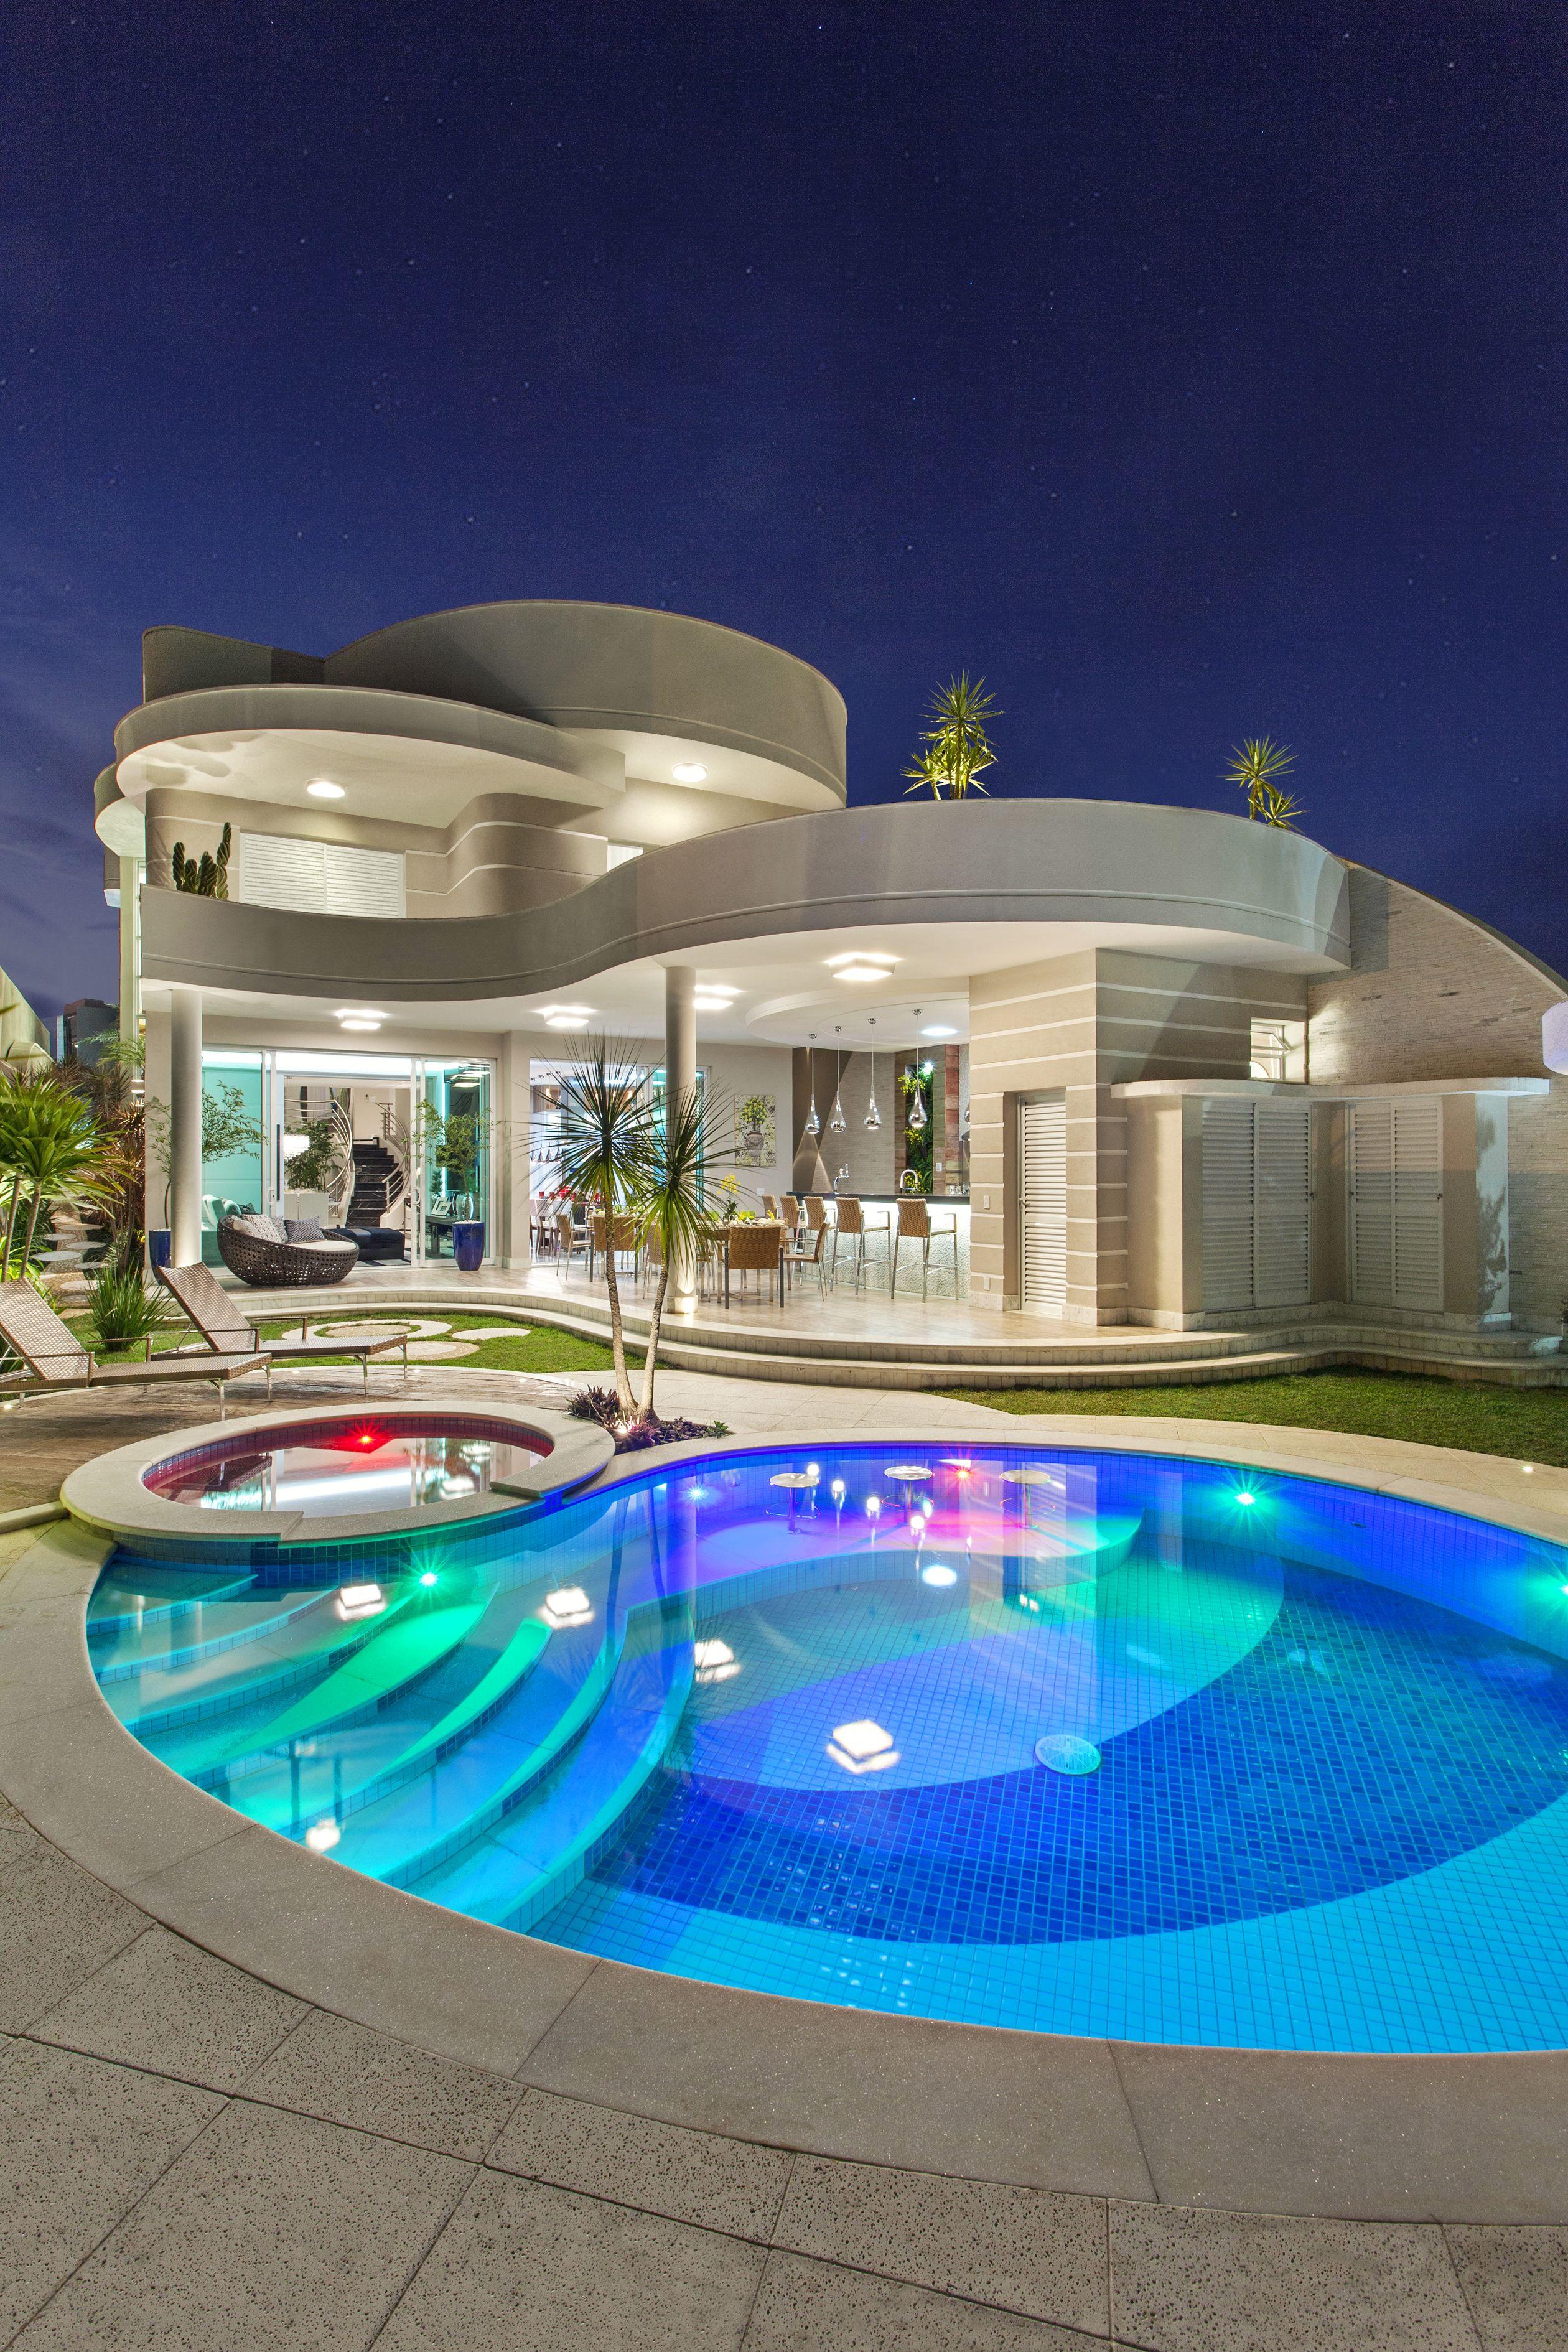 Projetos residencias casa tripoli arquiteto aquiles for Fotos de piscinas modernas en puerto rico